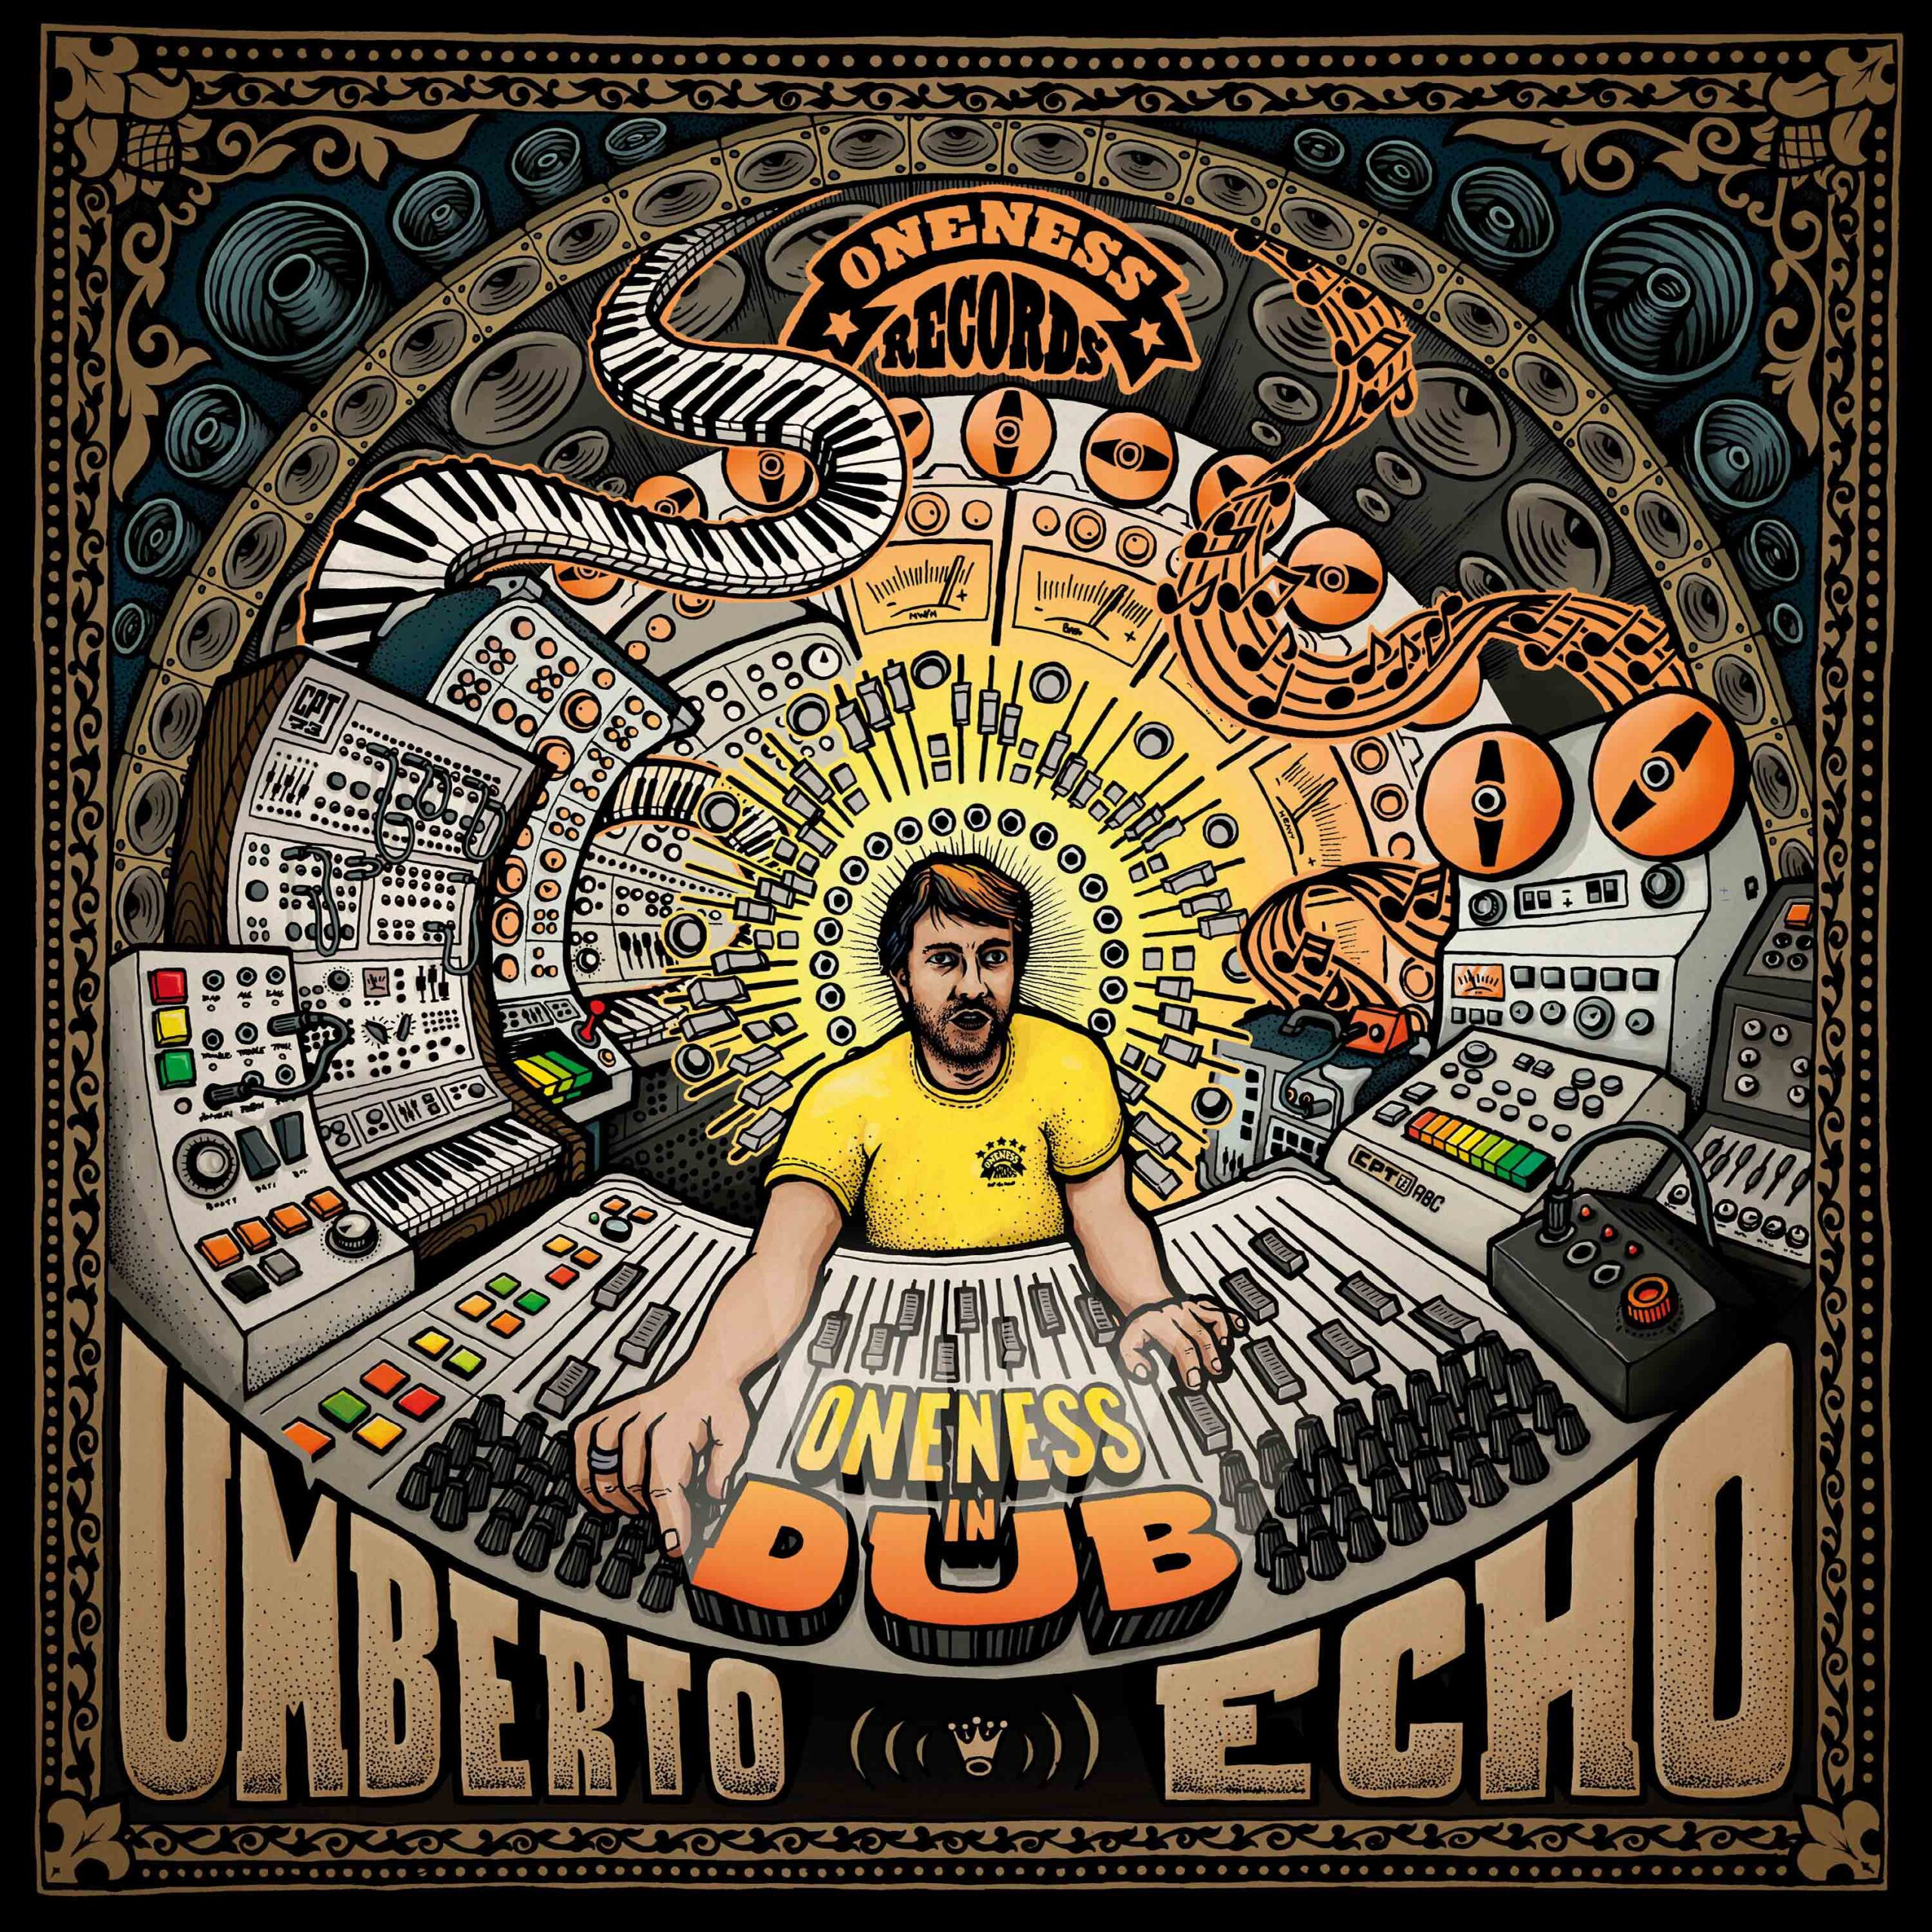 Umberto Echo Oneness In Dub